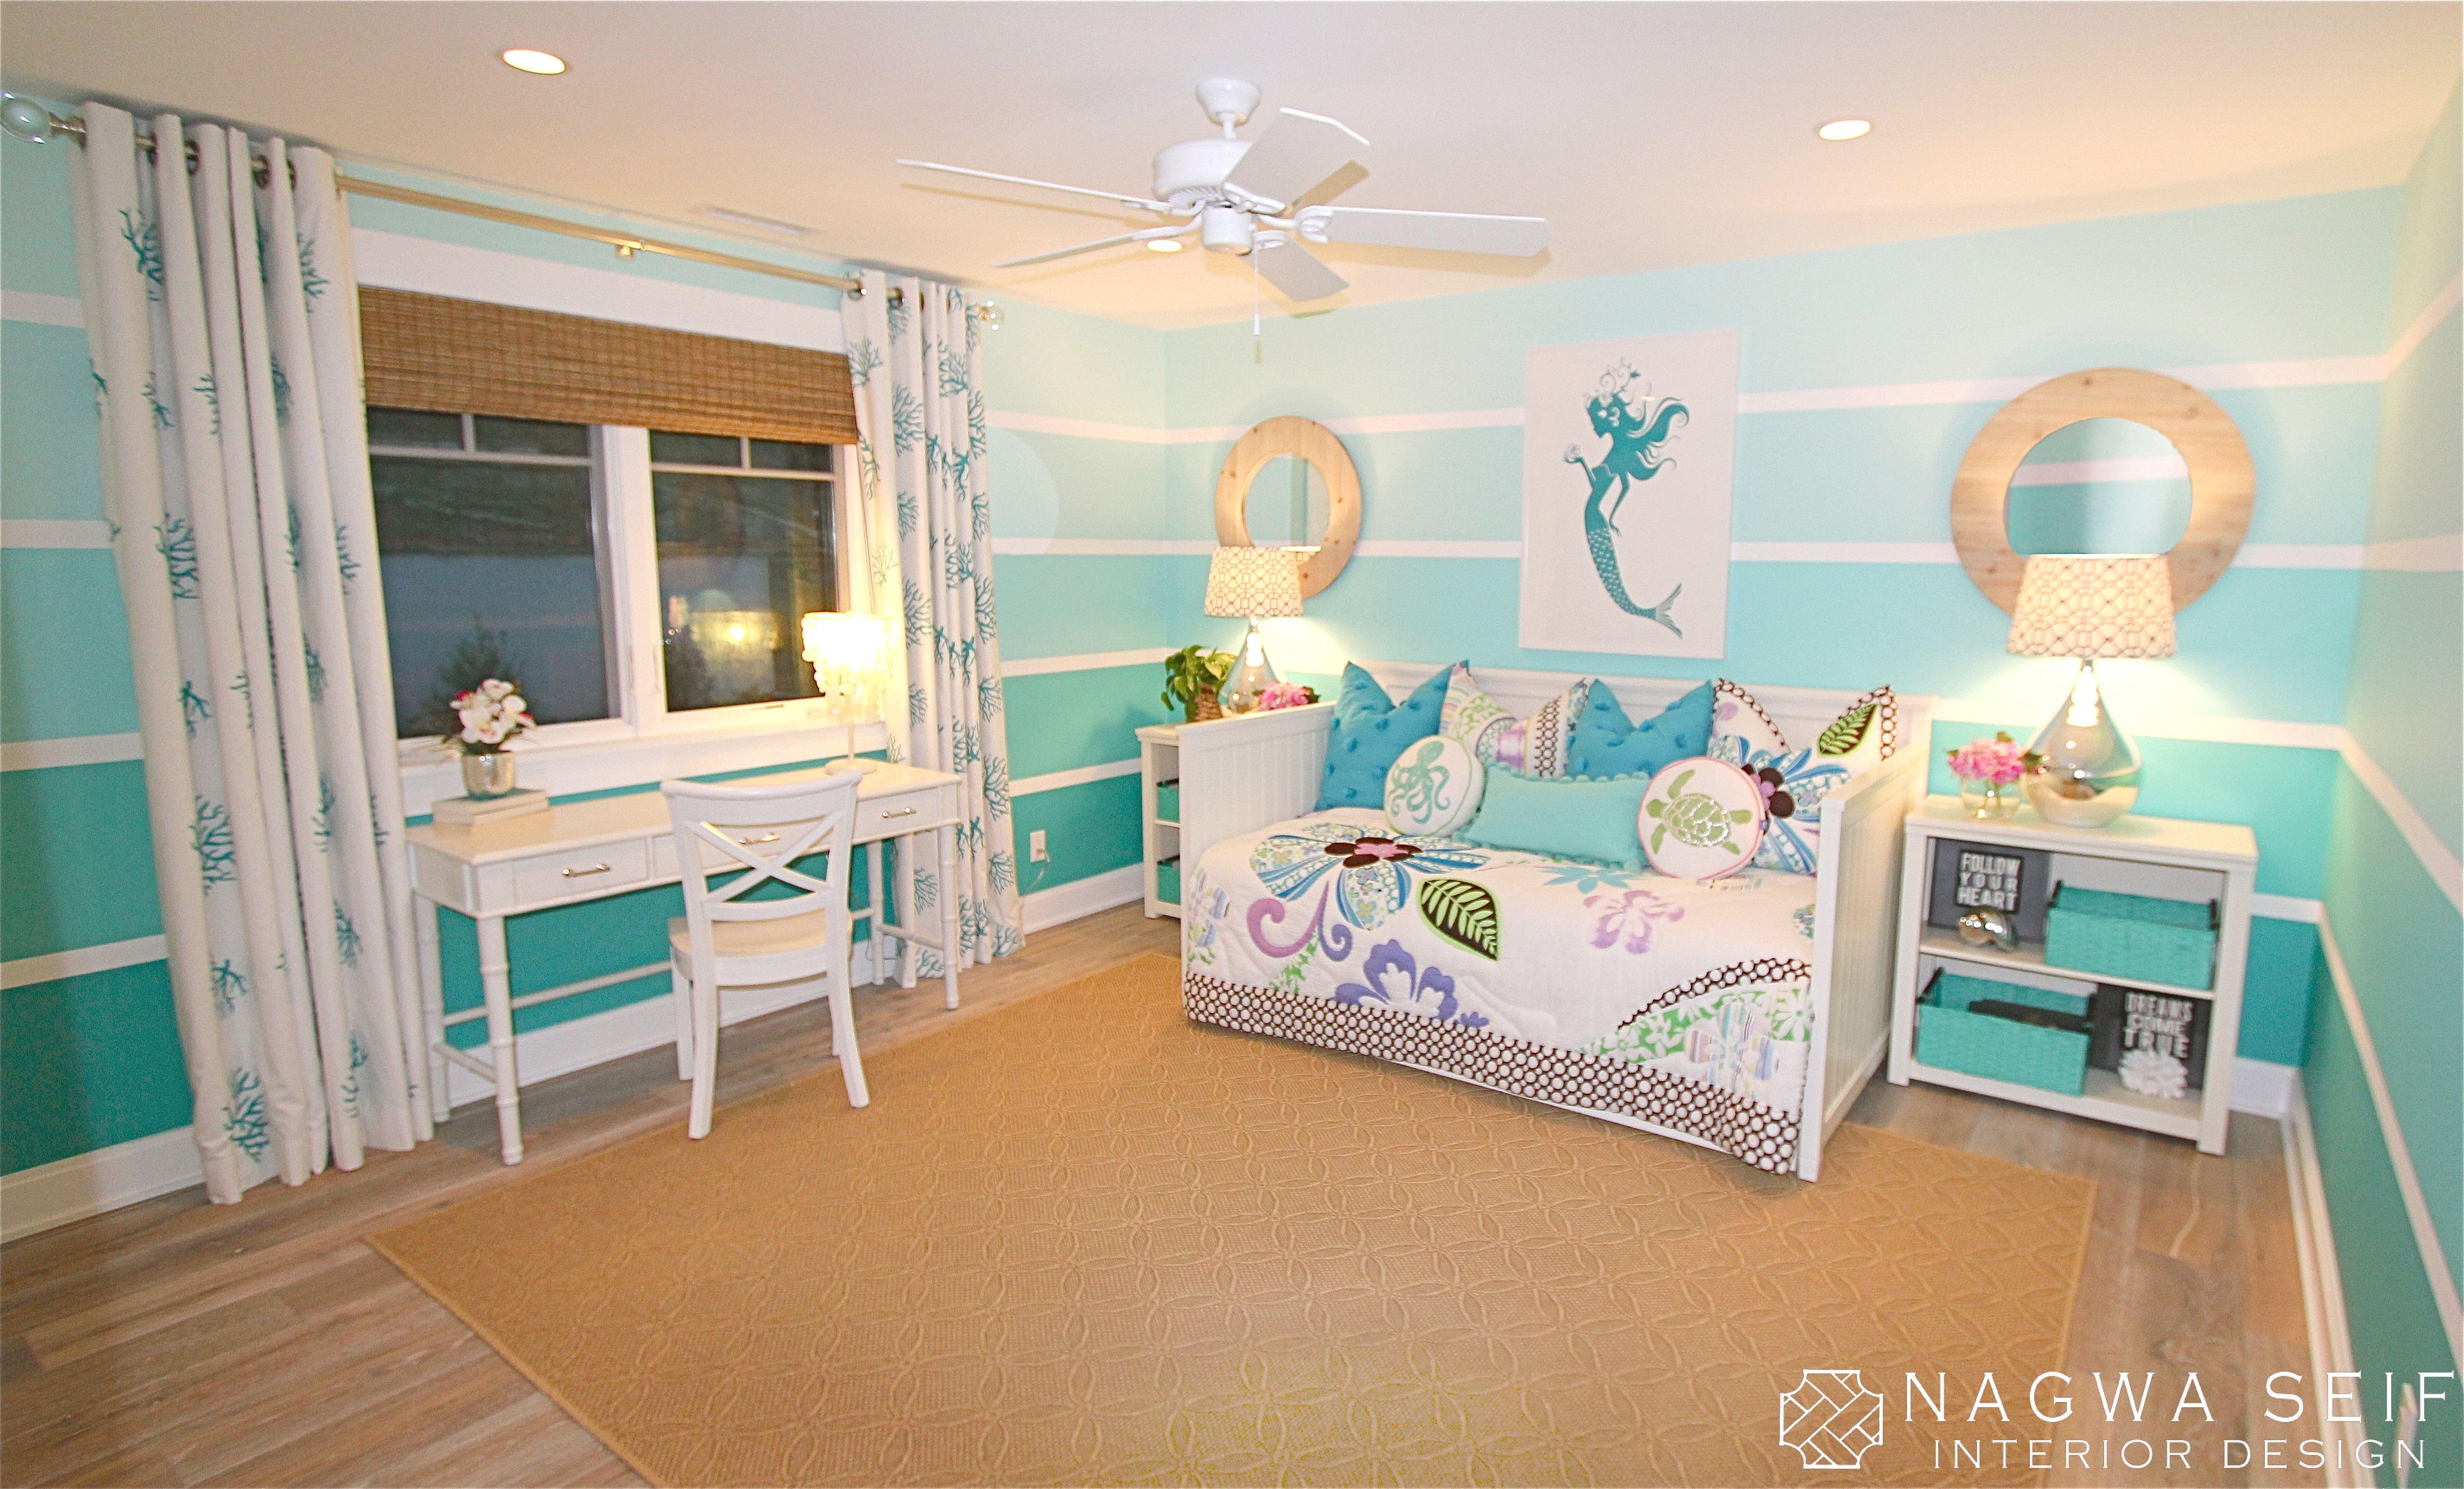 Nagwa Seif Interior Design Residential Interior Design And Blog Ocean Themed Bedroom Beach Themed Bedroom Bedroom Themes